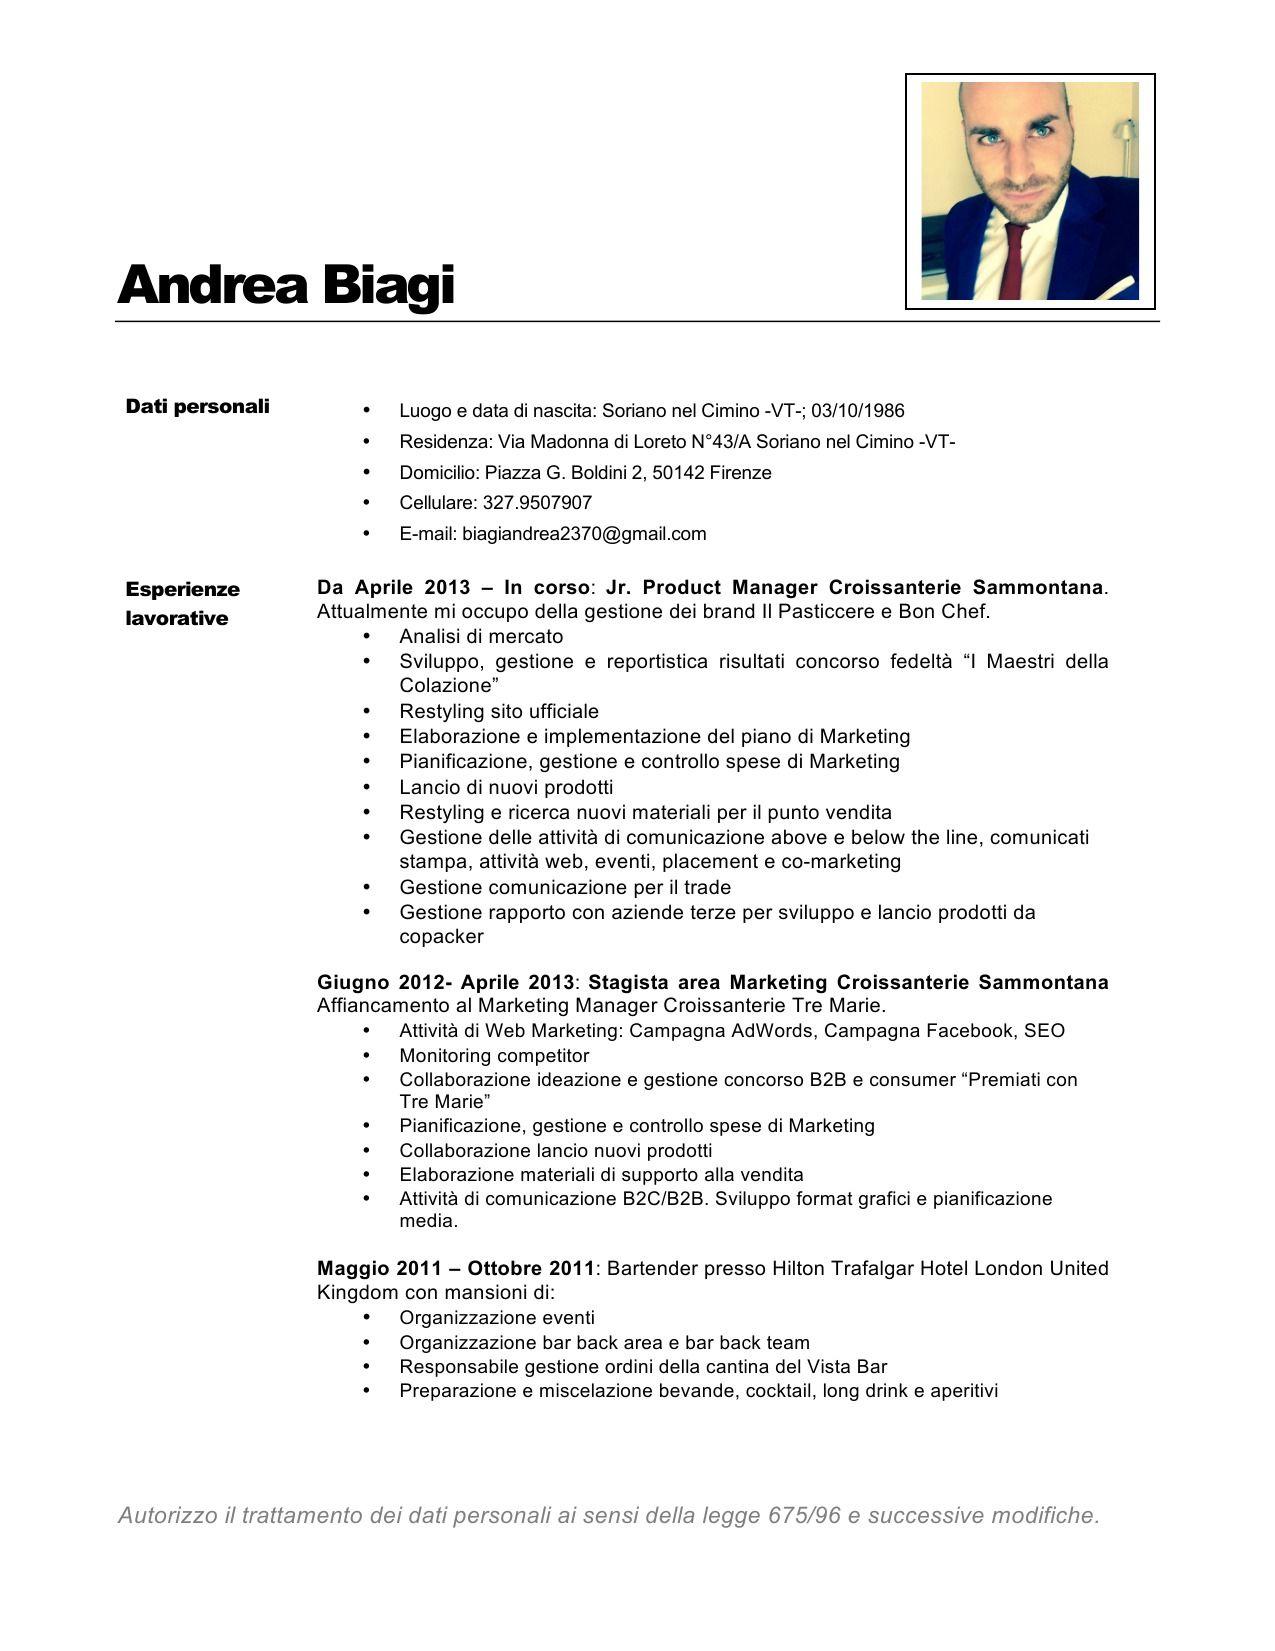 CV Andrea Biagi pagina 1 | Curriculum Vitae | Pinterest